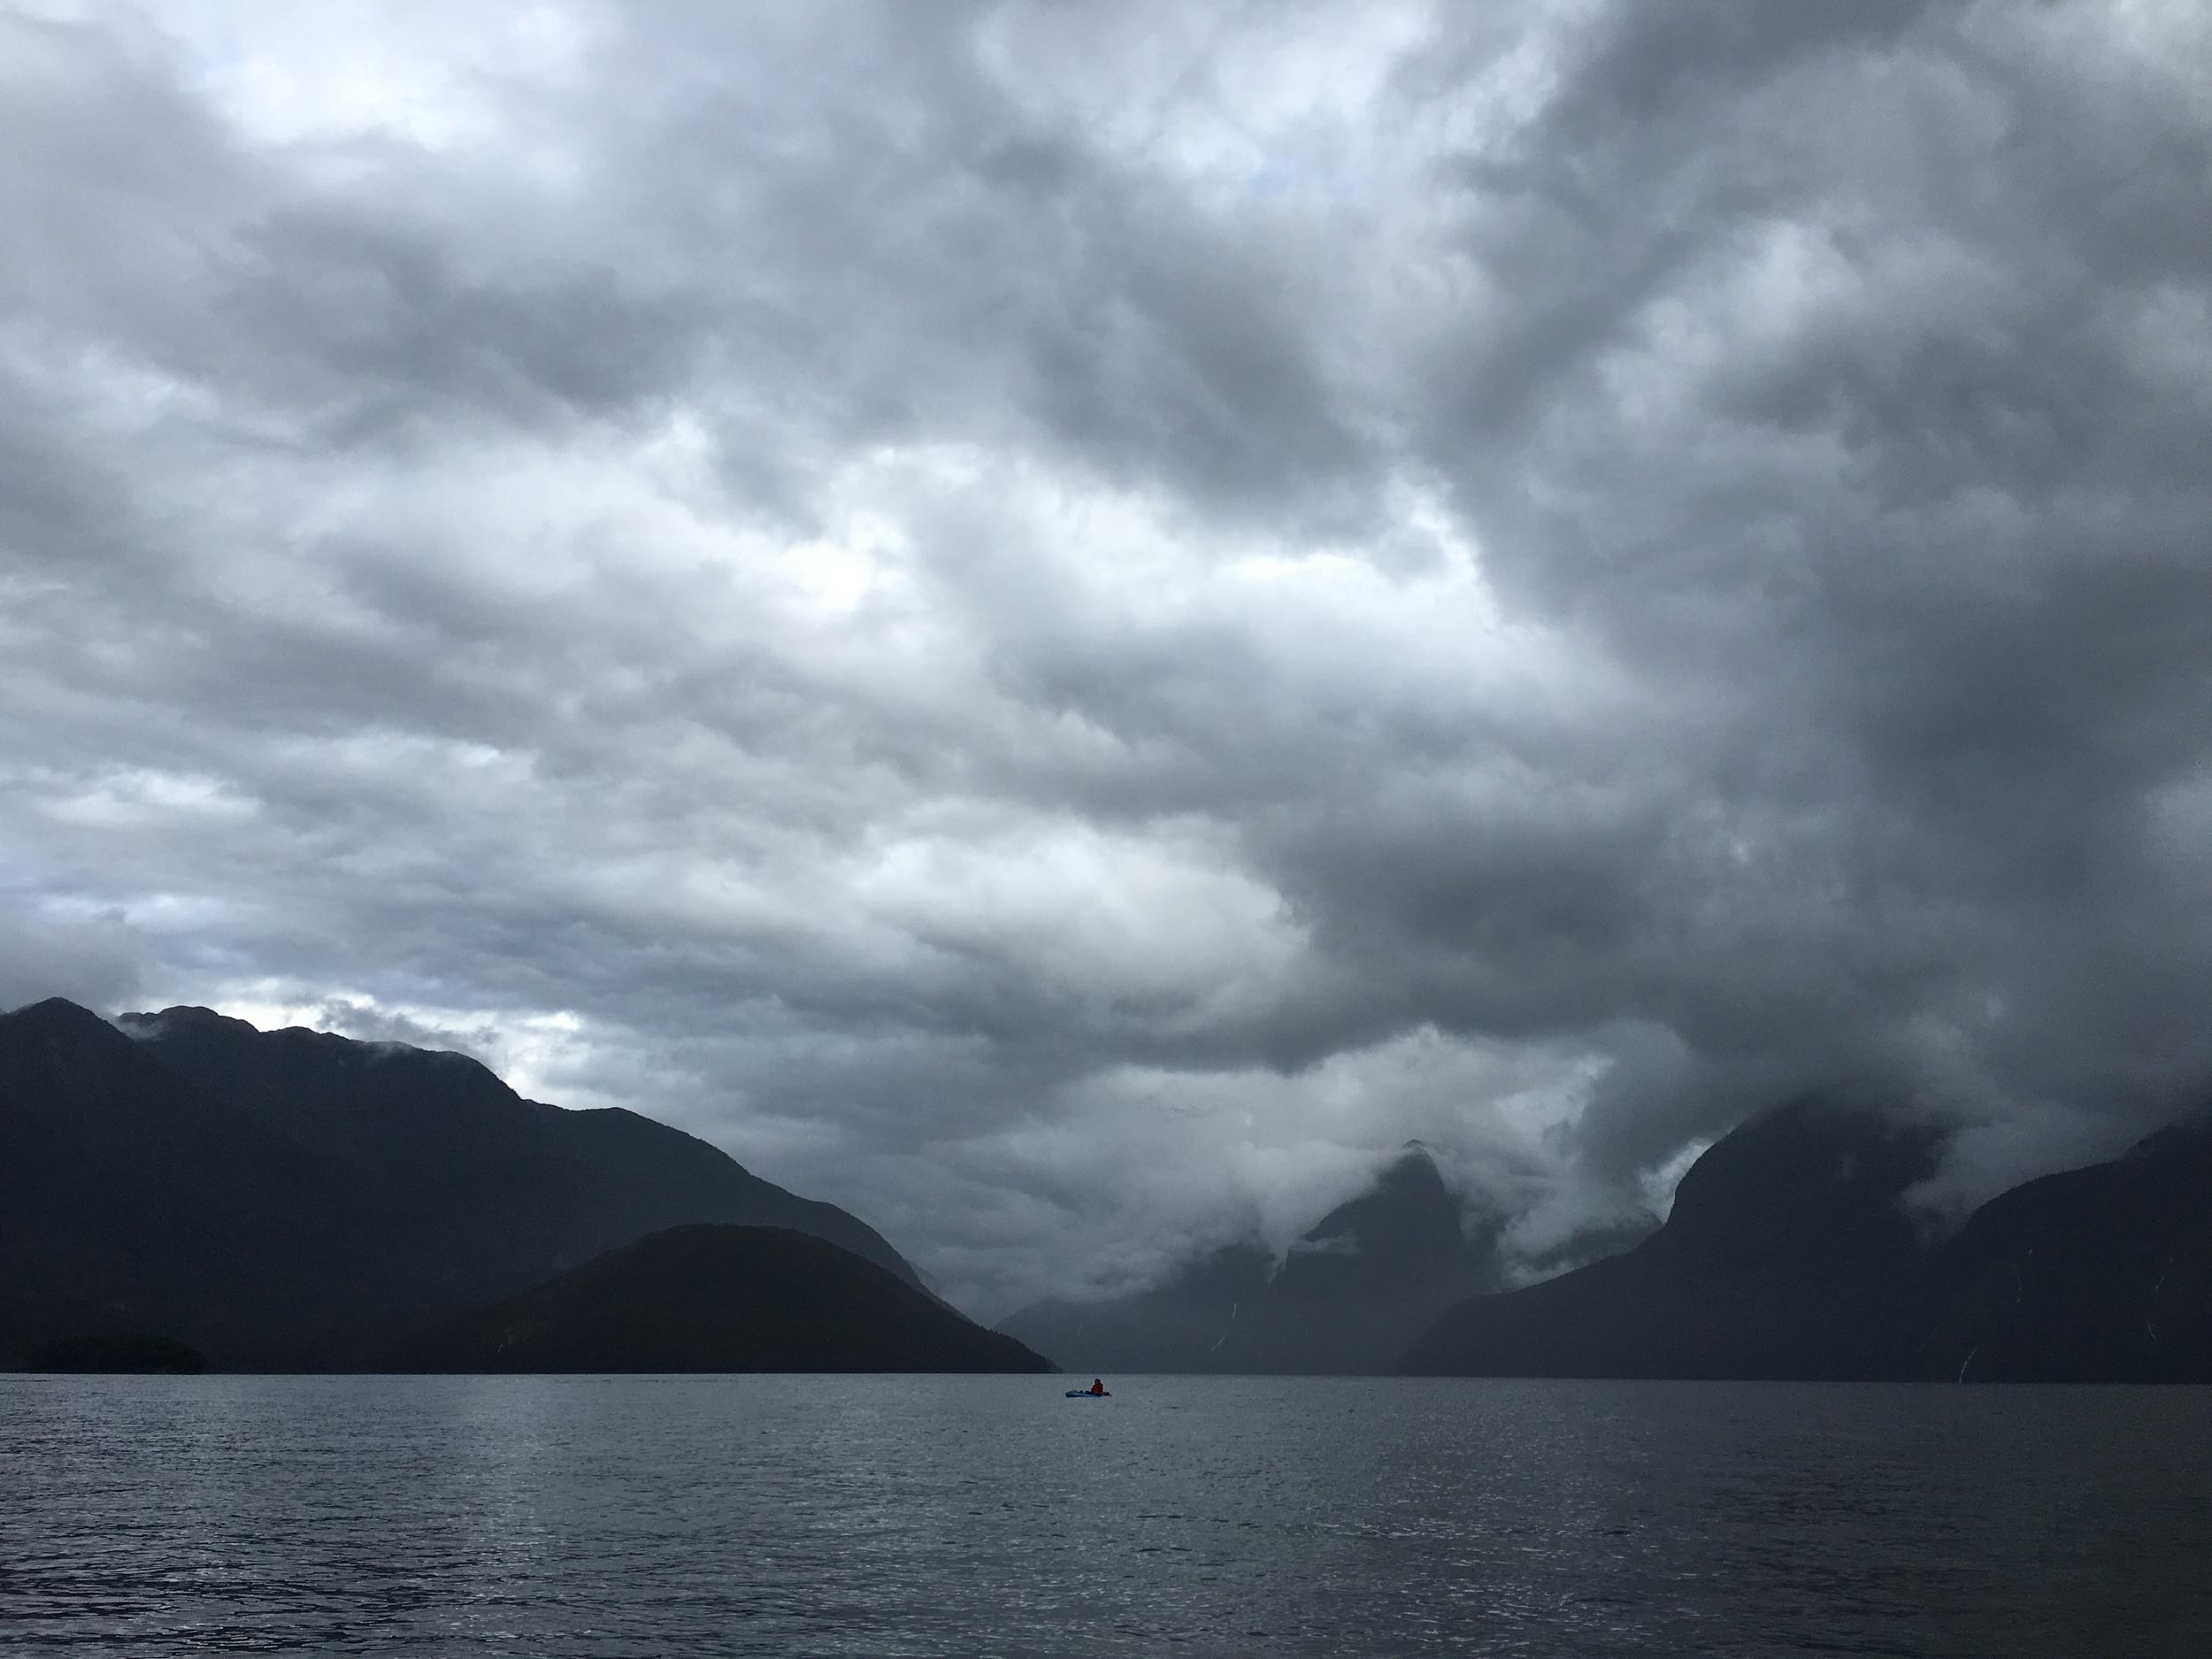 Kayaking in Doubtful Sound